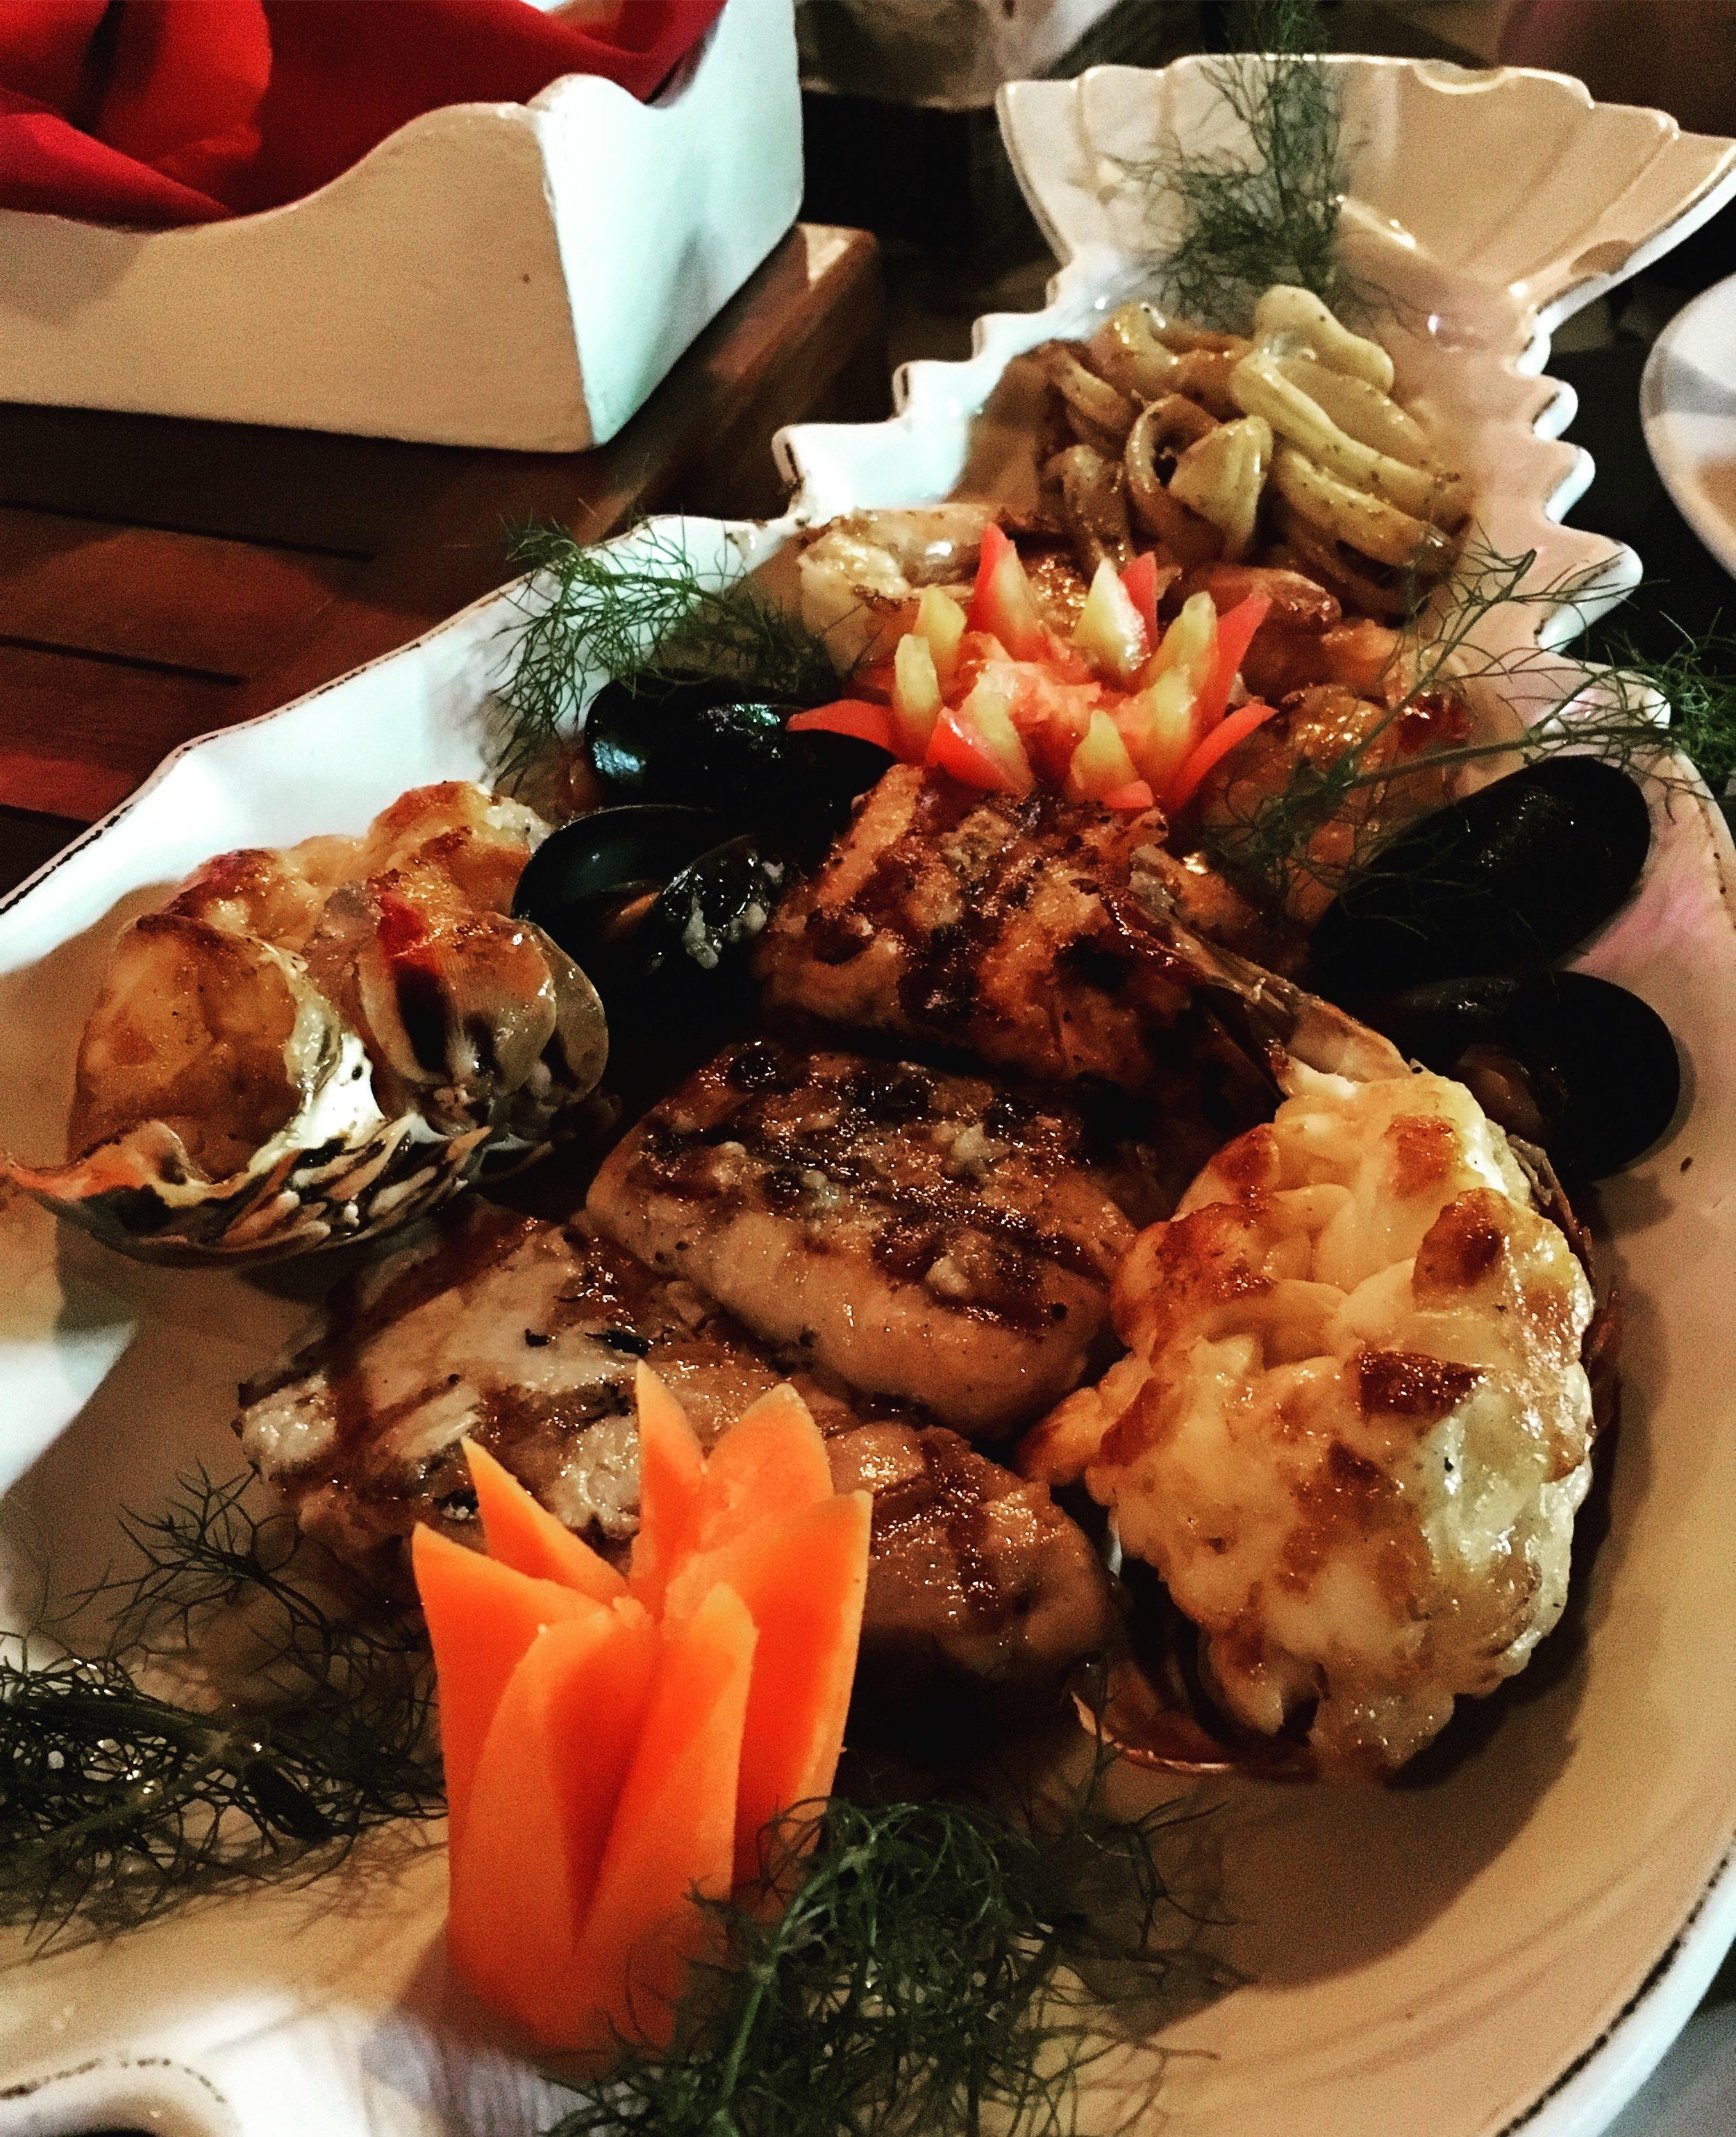 playa-del-carmen-food.JPG